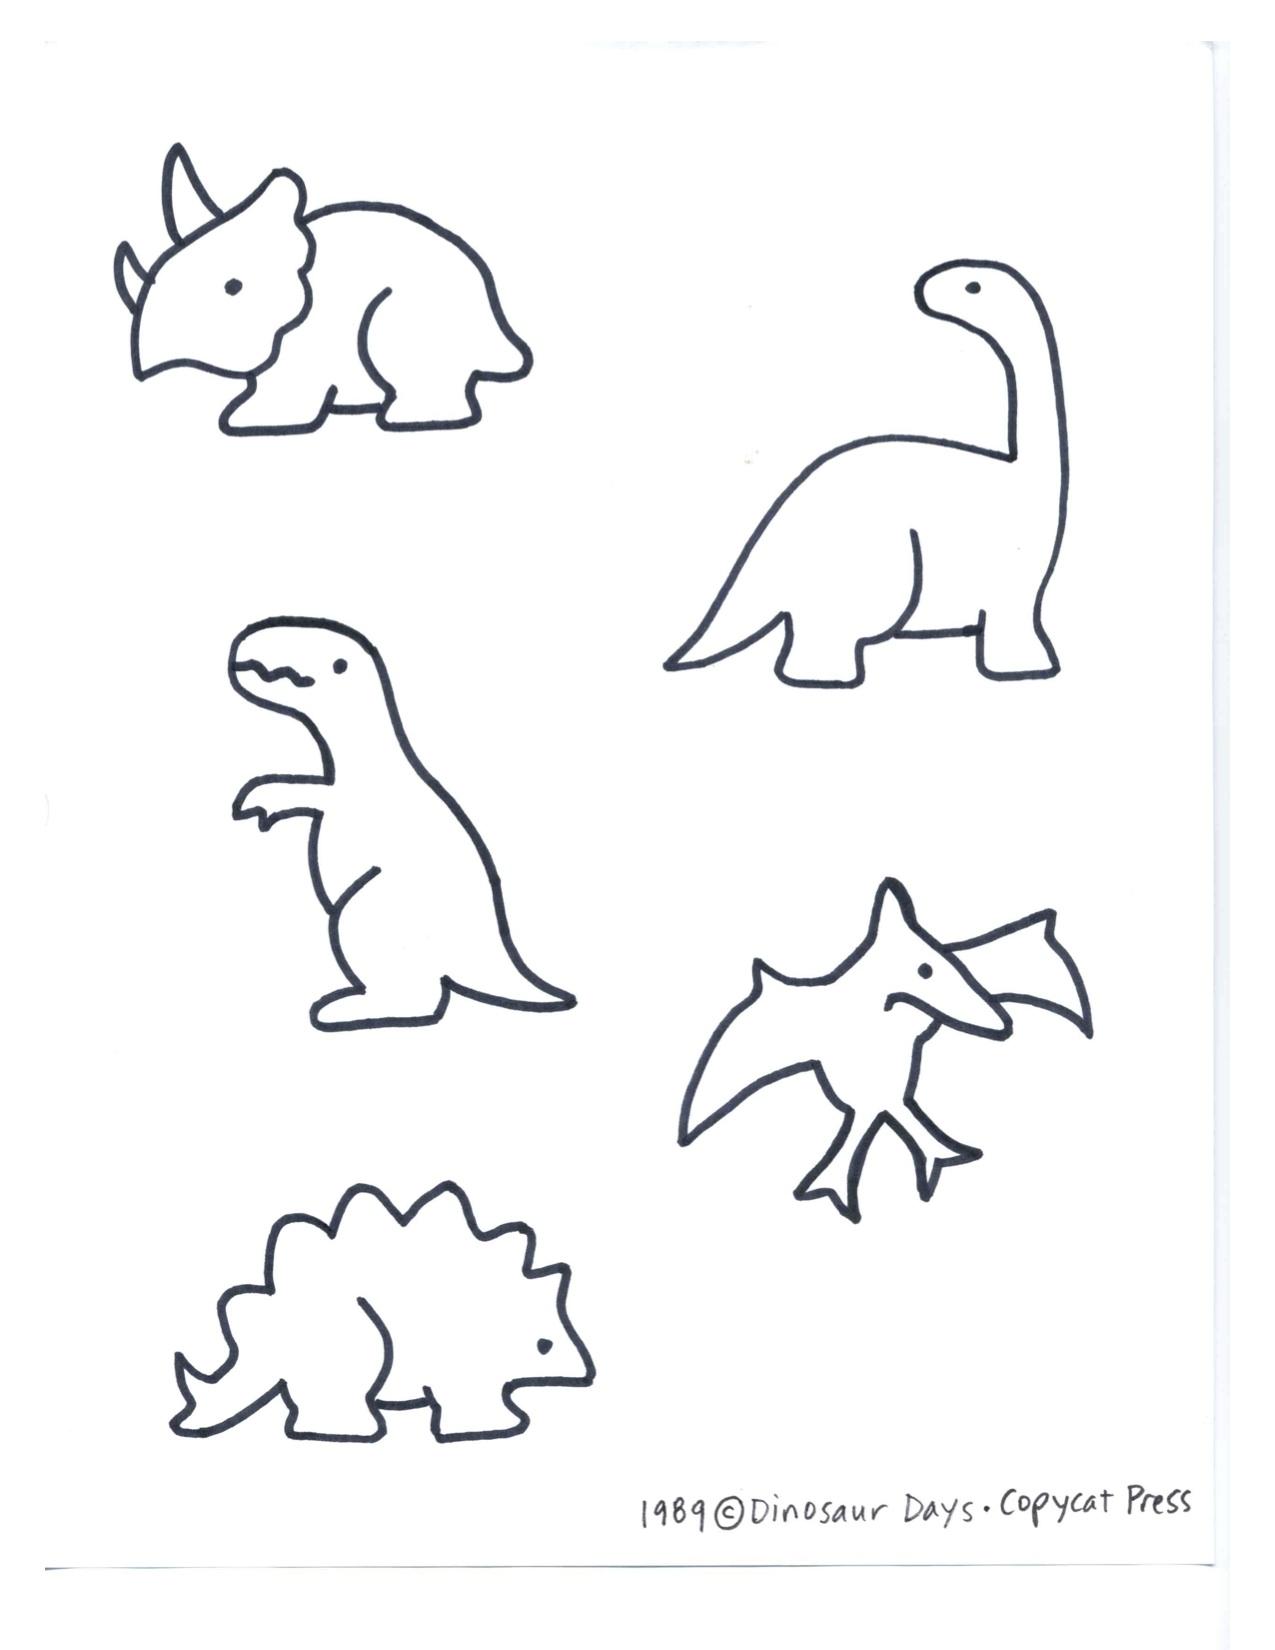 1275x1650 Dinosaurs Kindergarten Nana Intended For Simple Dinosaur Drawing